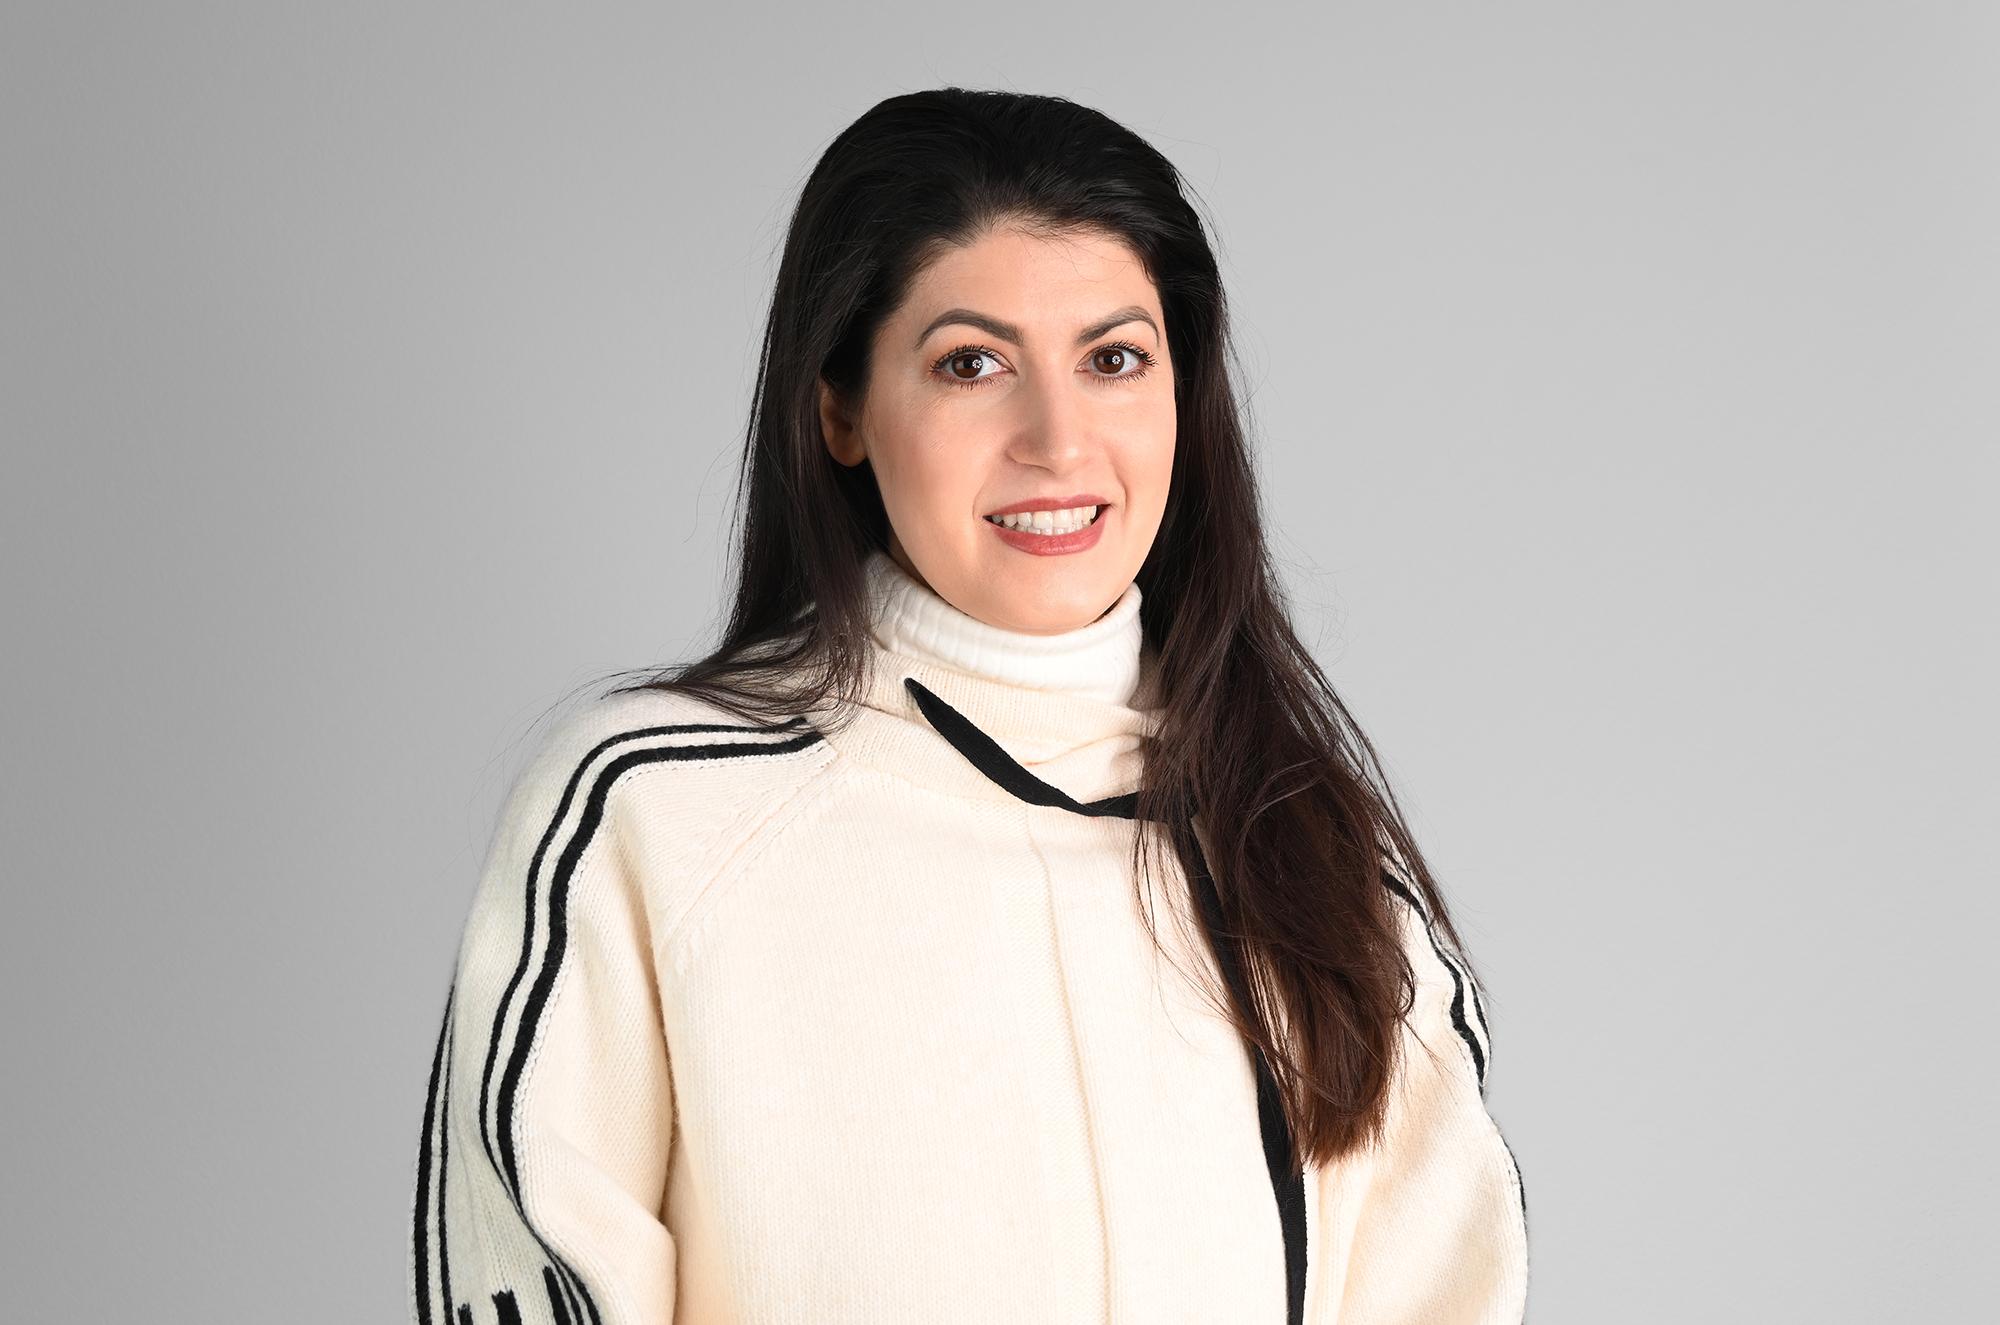 Victoria Pauli